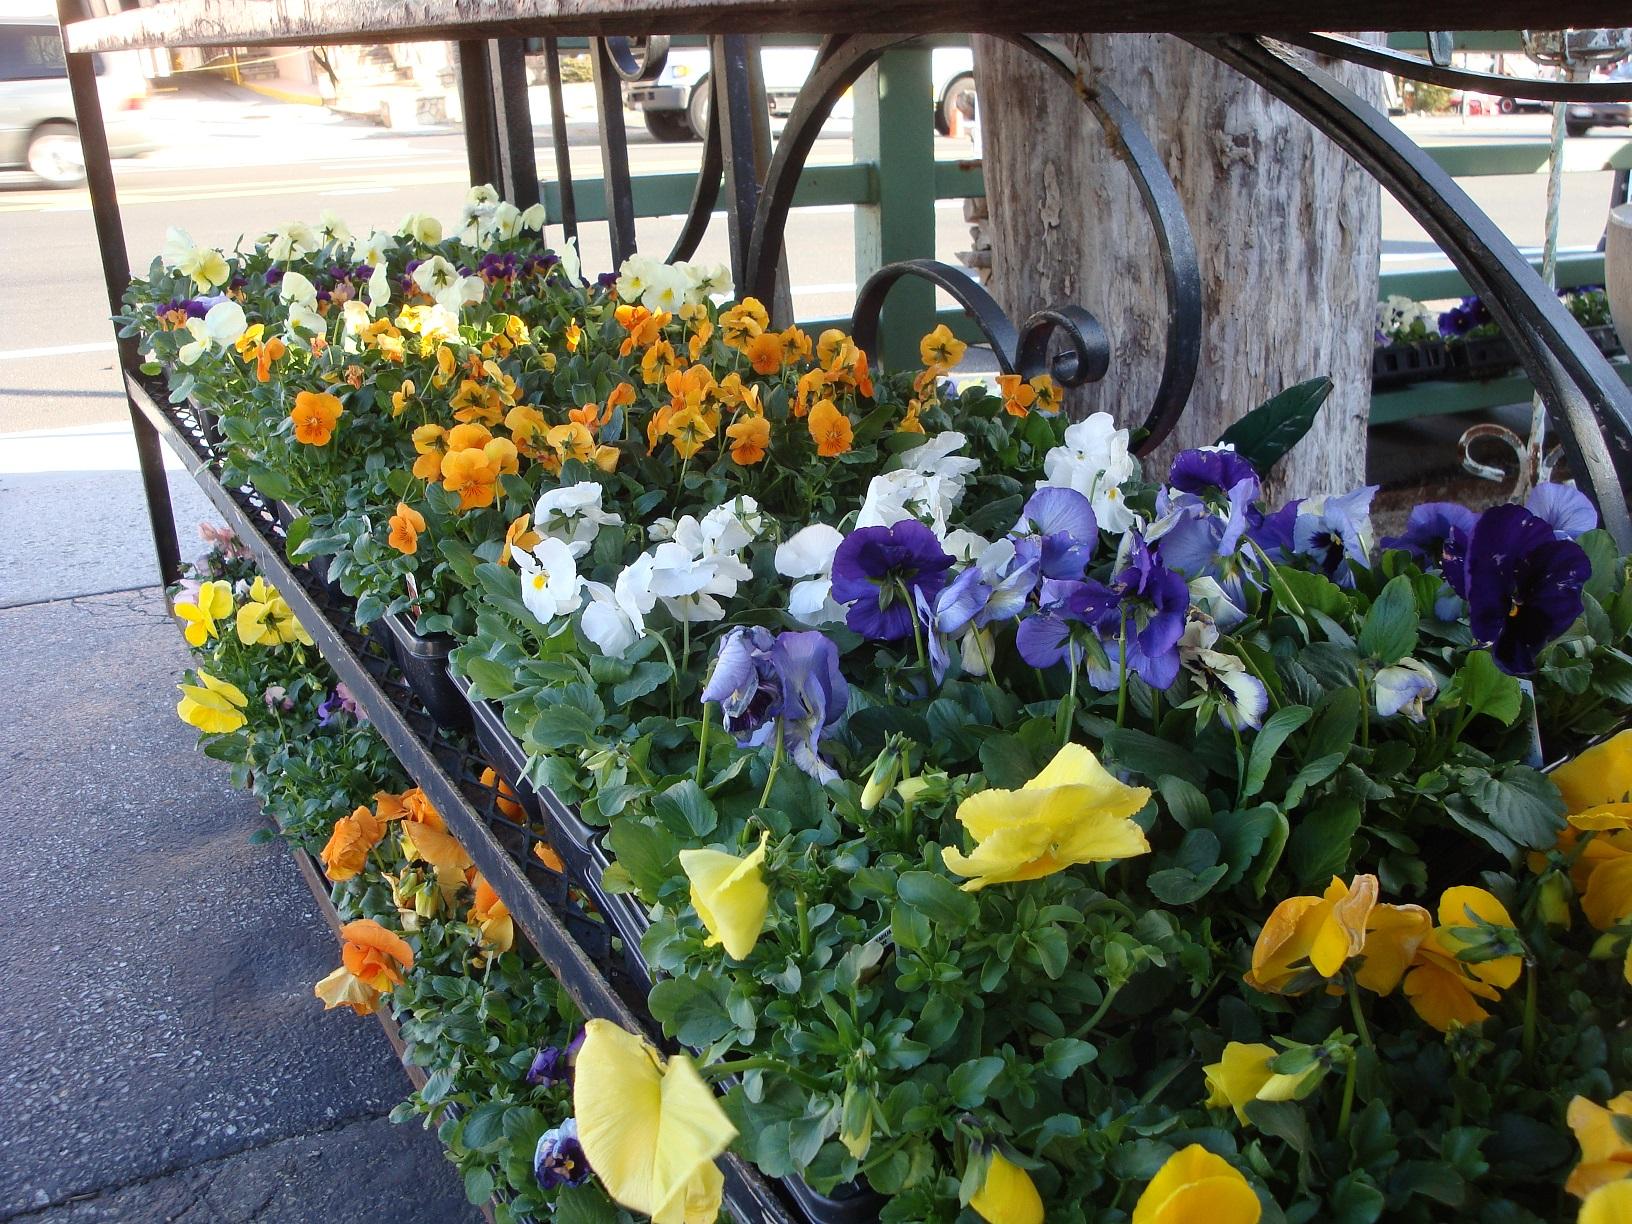 Tony Distefano Landscape Garden Center image 9